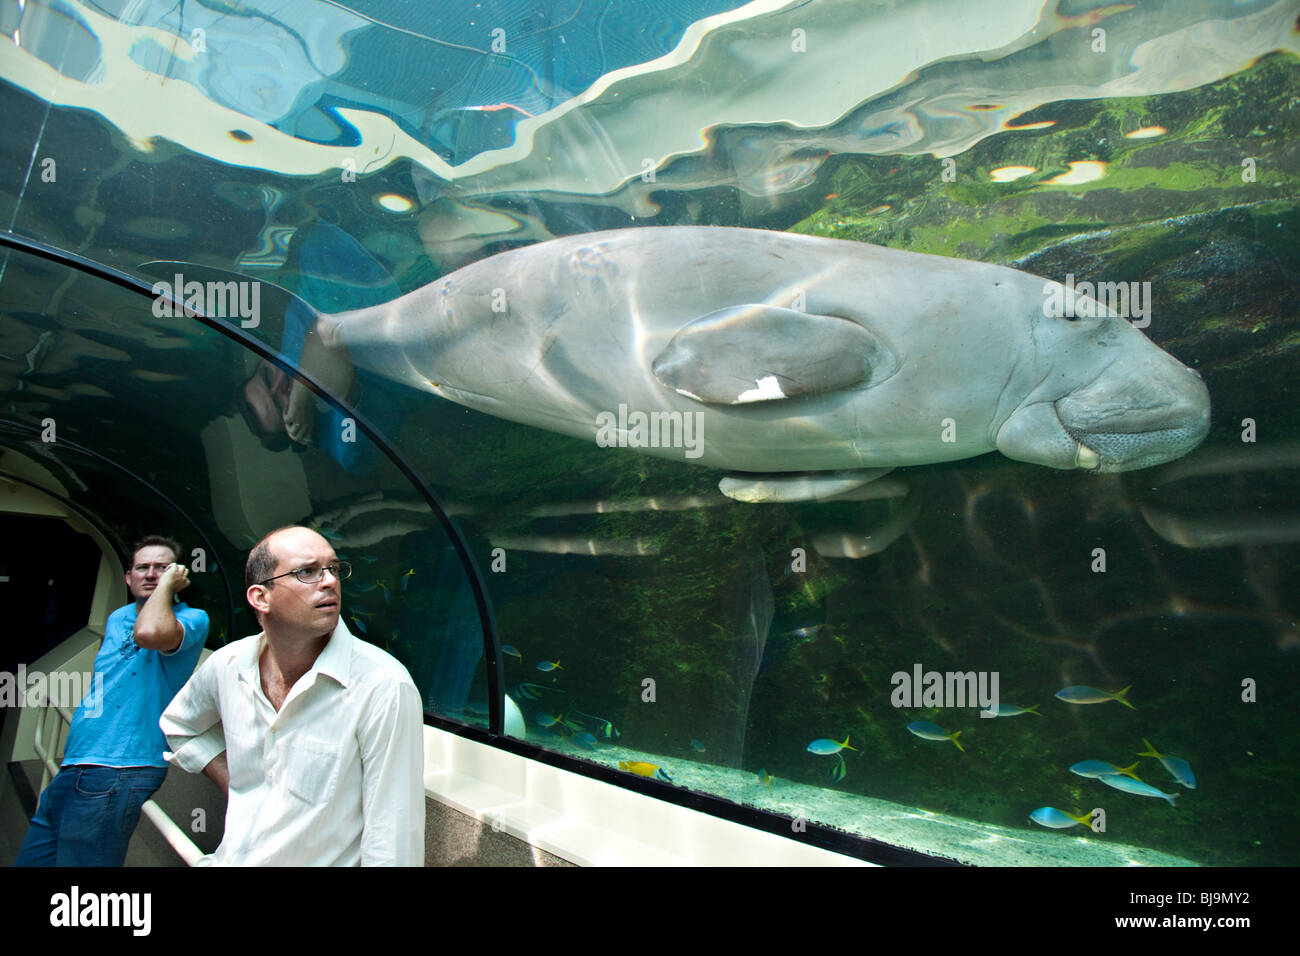 Tourists watching Dugong in Sydney Aquarium, Australia - Stock Image